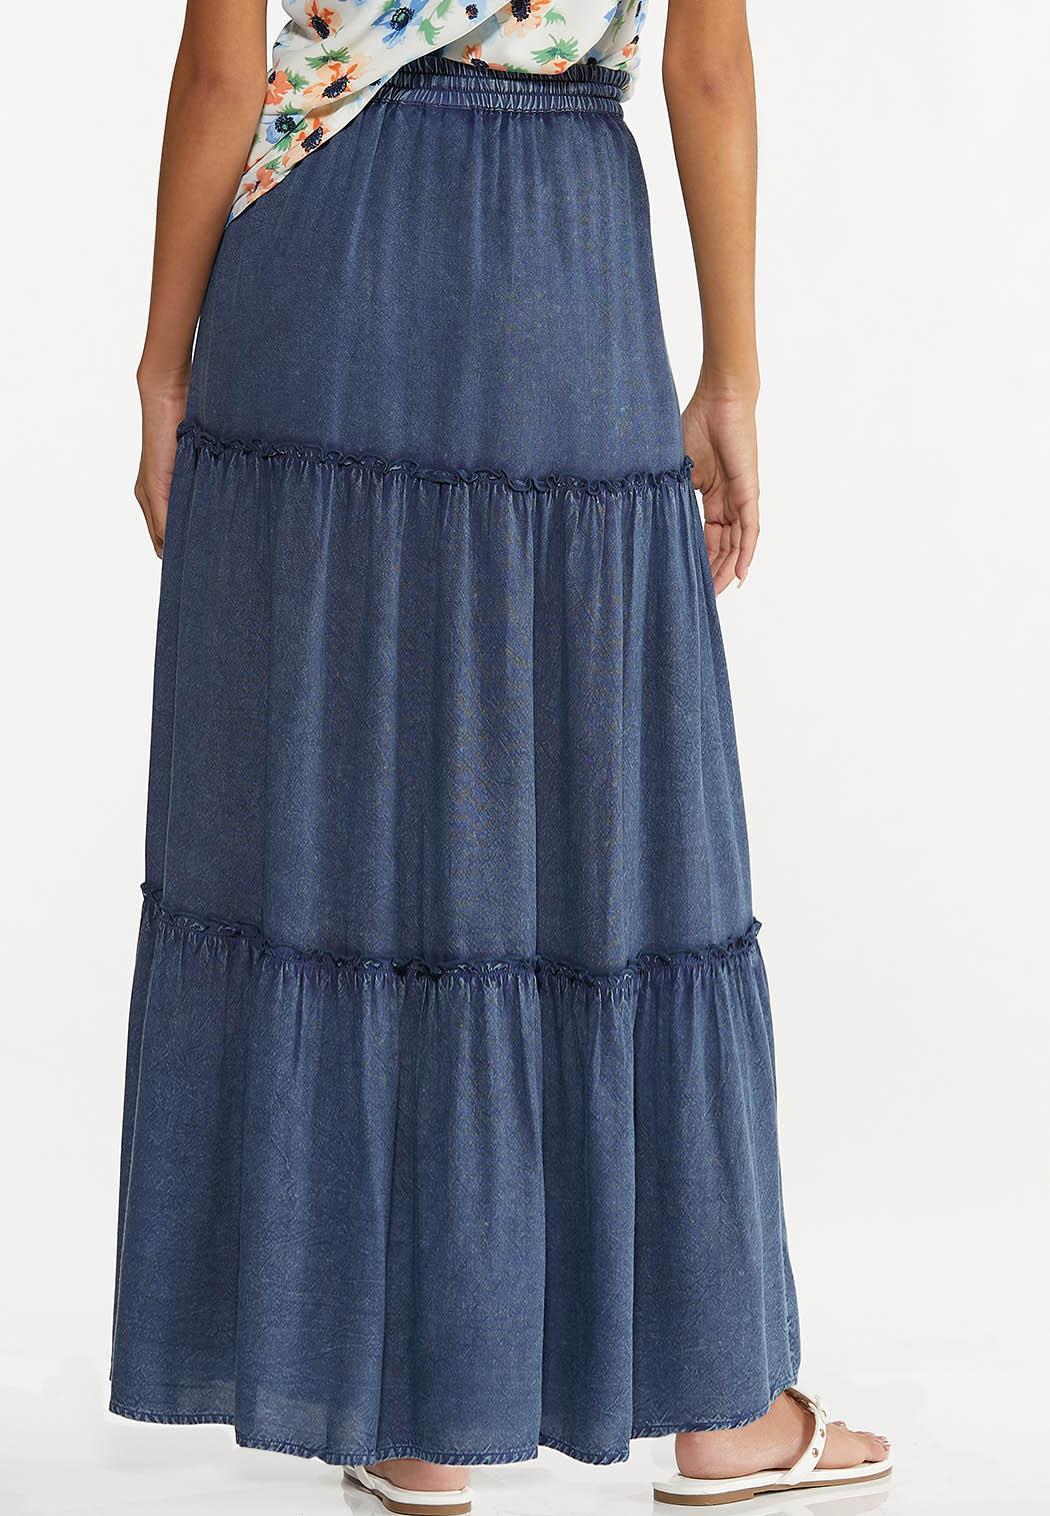 Plus Size Ruffled Vintage Blue Maxi Skirt (Item #44551027)